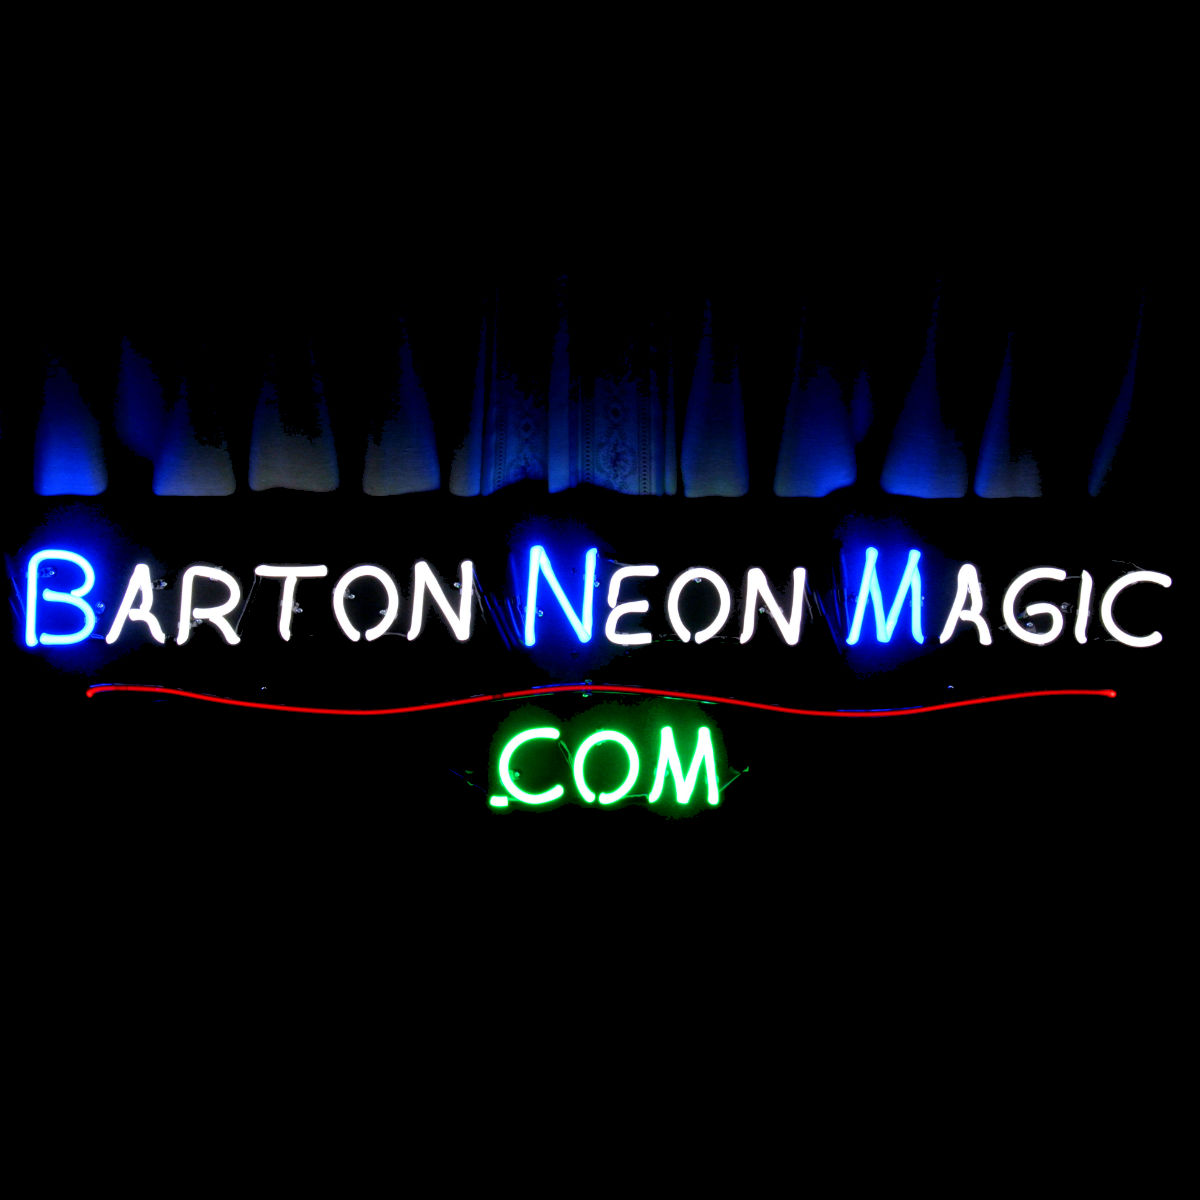 Custom Neon Light Sculptures, Neon Artworks, and Neon Chandeliers by John Barton - BartonNeonMagic.com